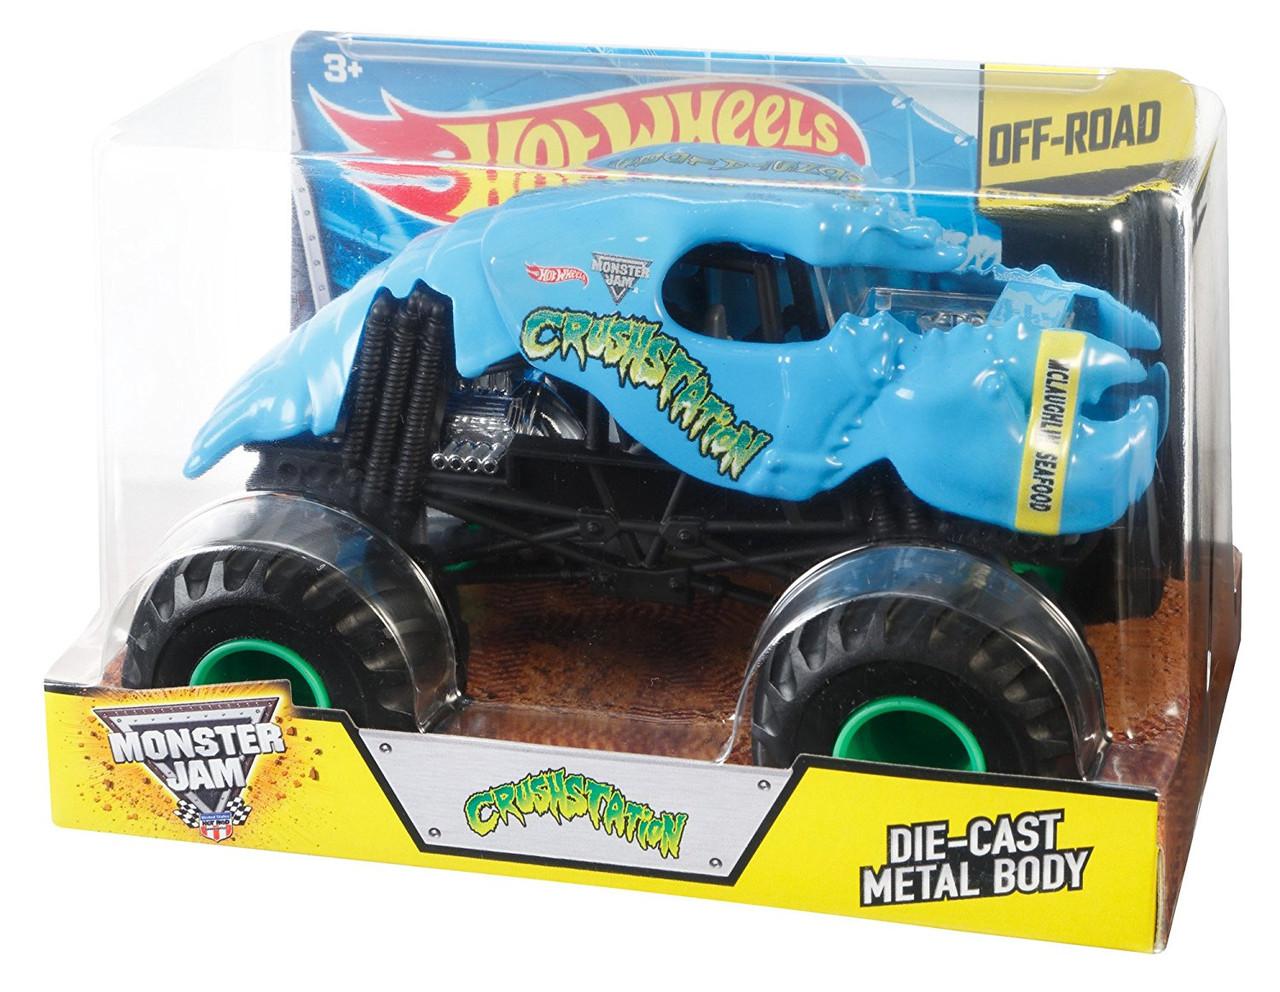 Машинка Хот Вилз Монстр джем внедорожник масштаб 1:24 / Hot Wheels Monster Jam Crushstation